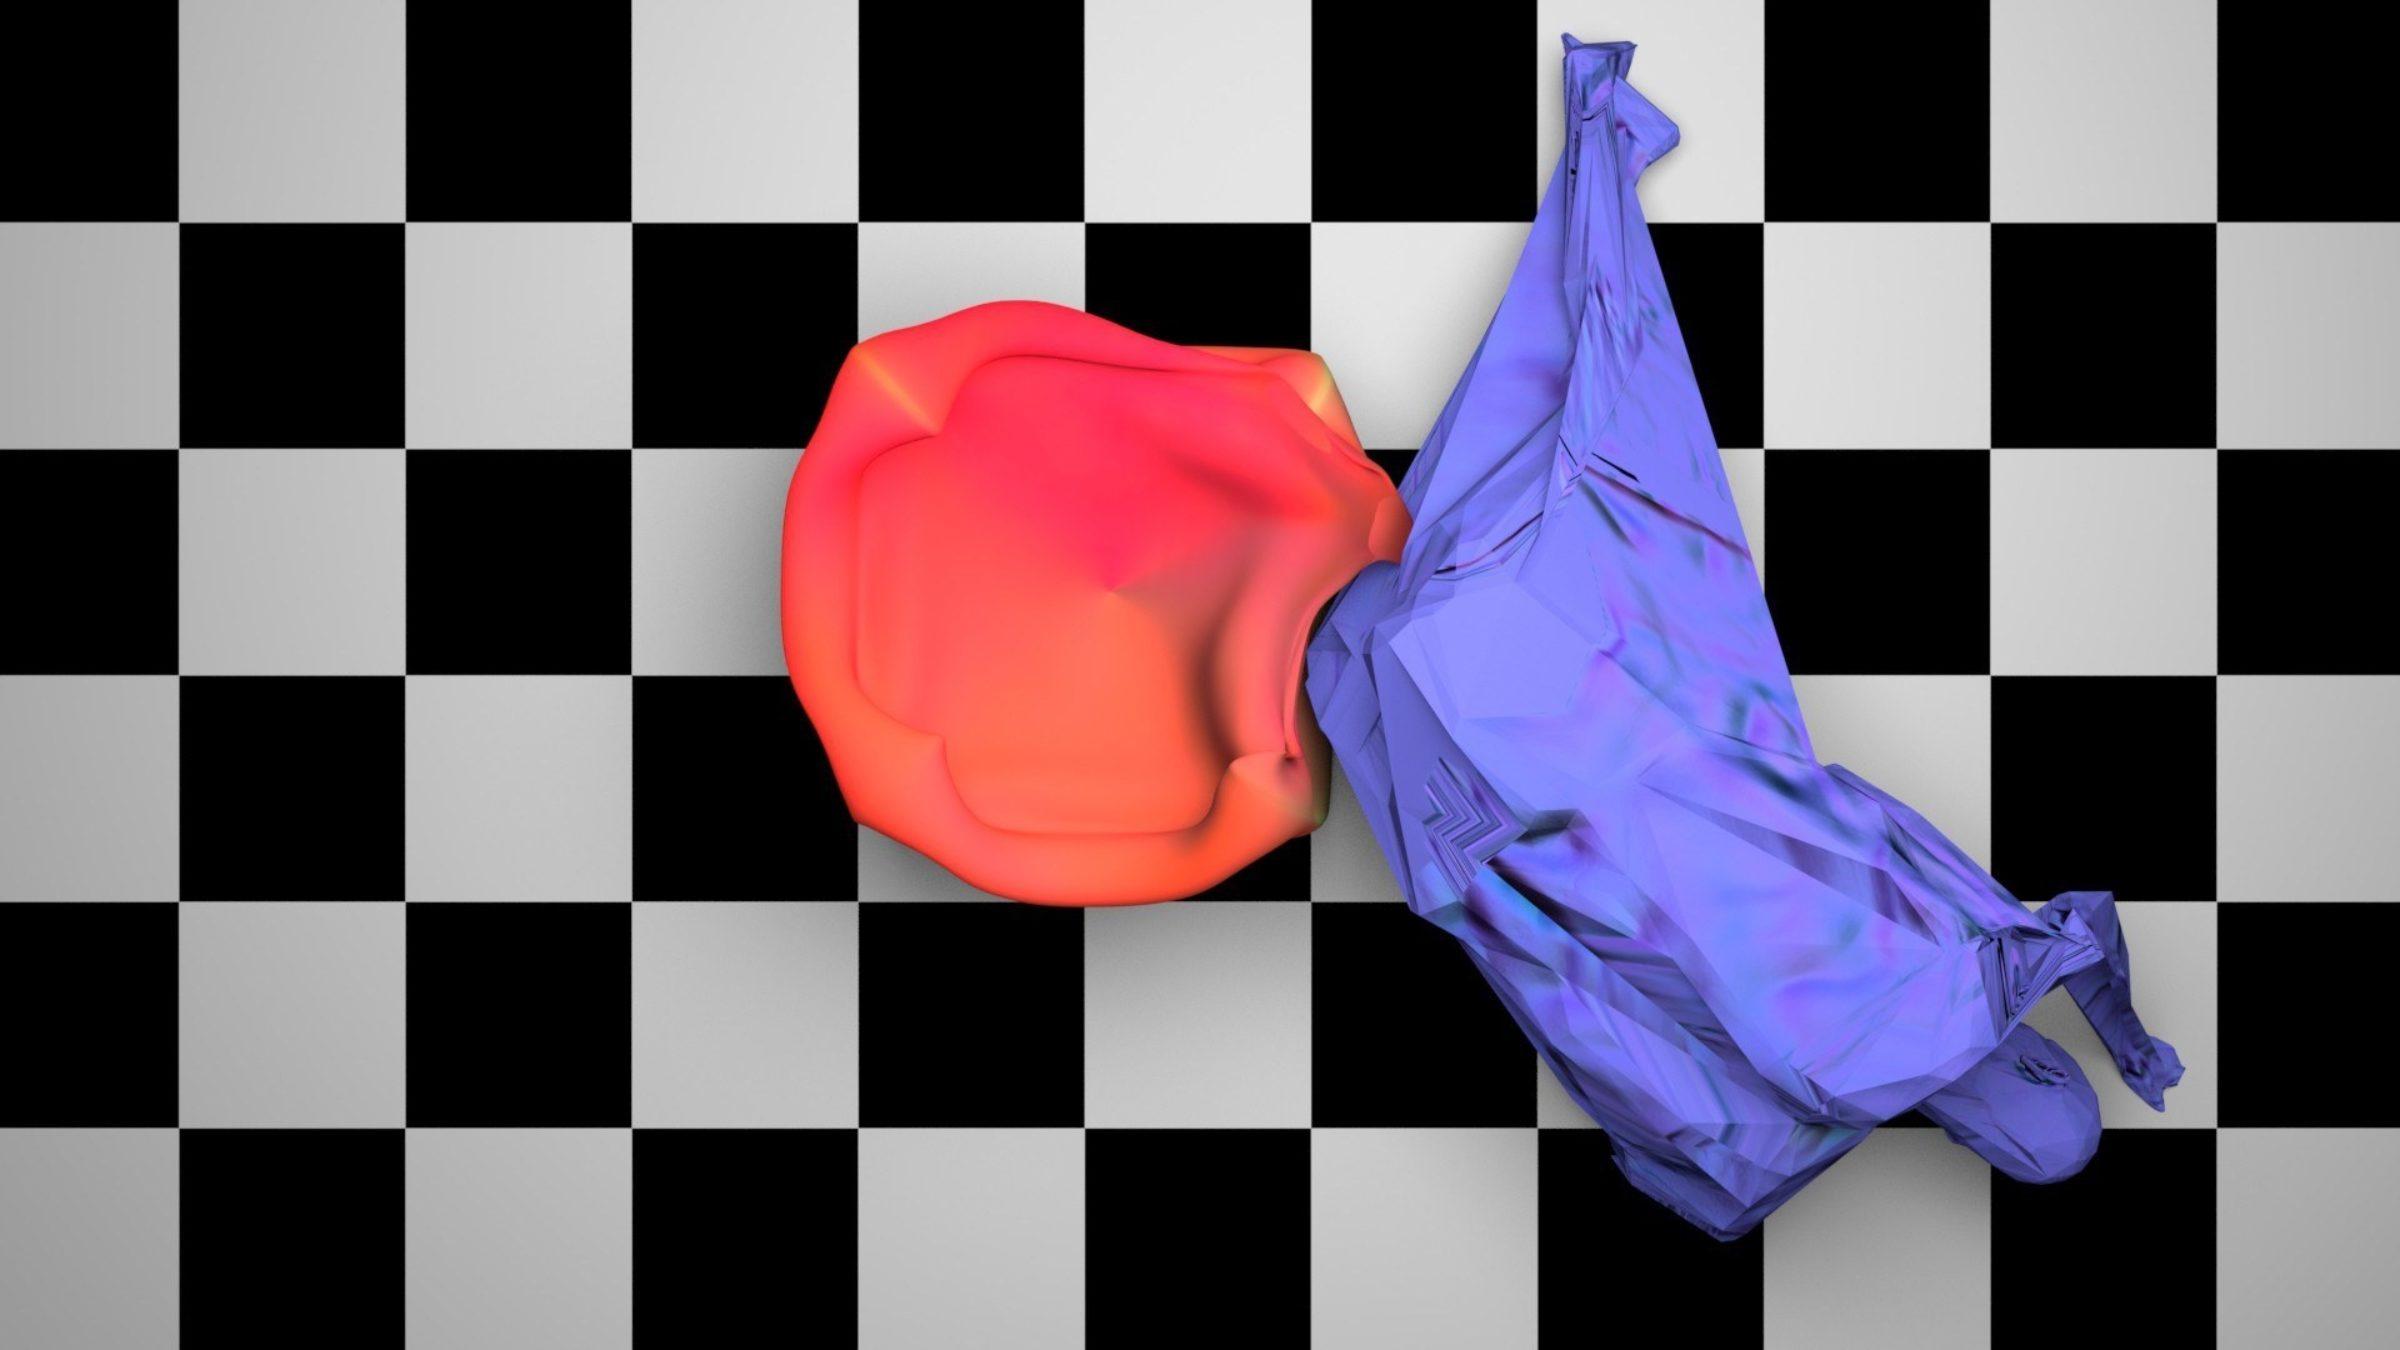 Sisyphus SCN 1 horizontal 1698 1541585556 35ht64ccau